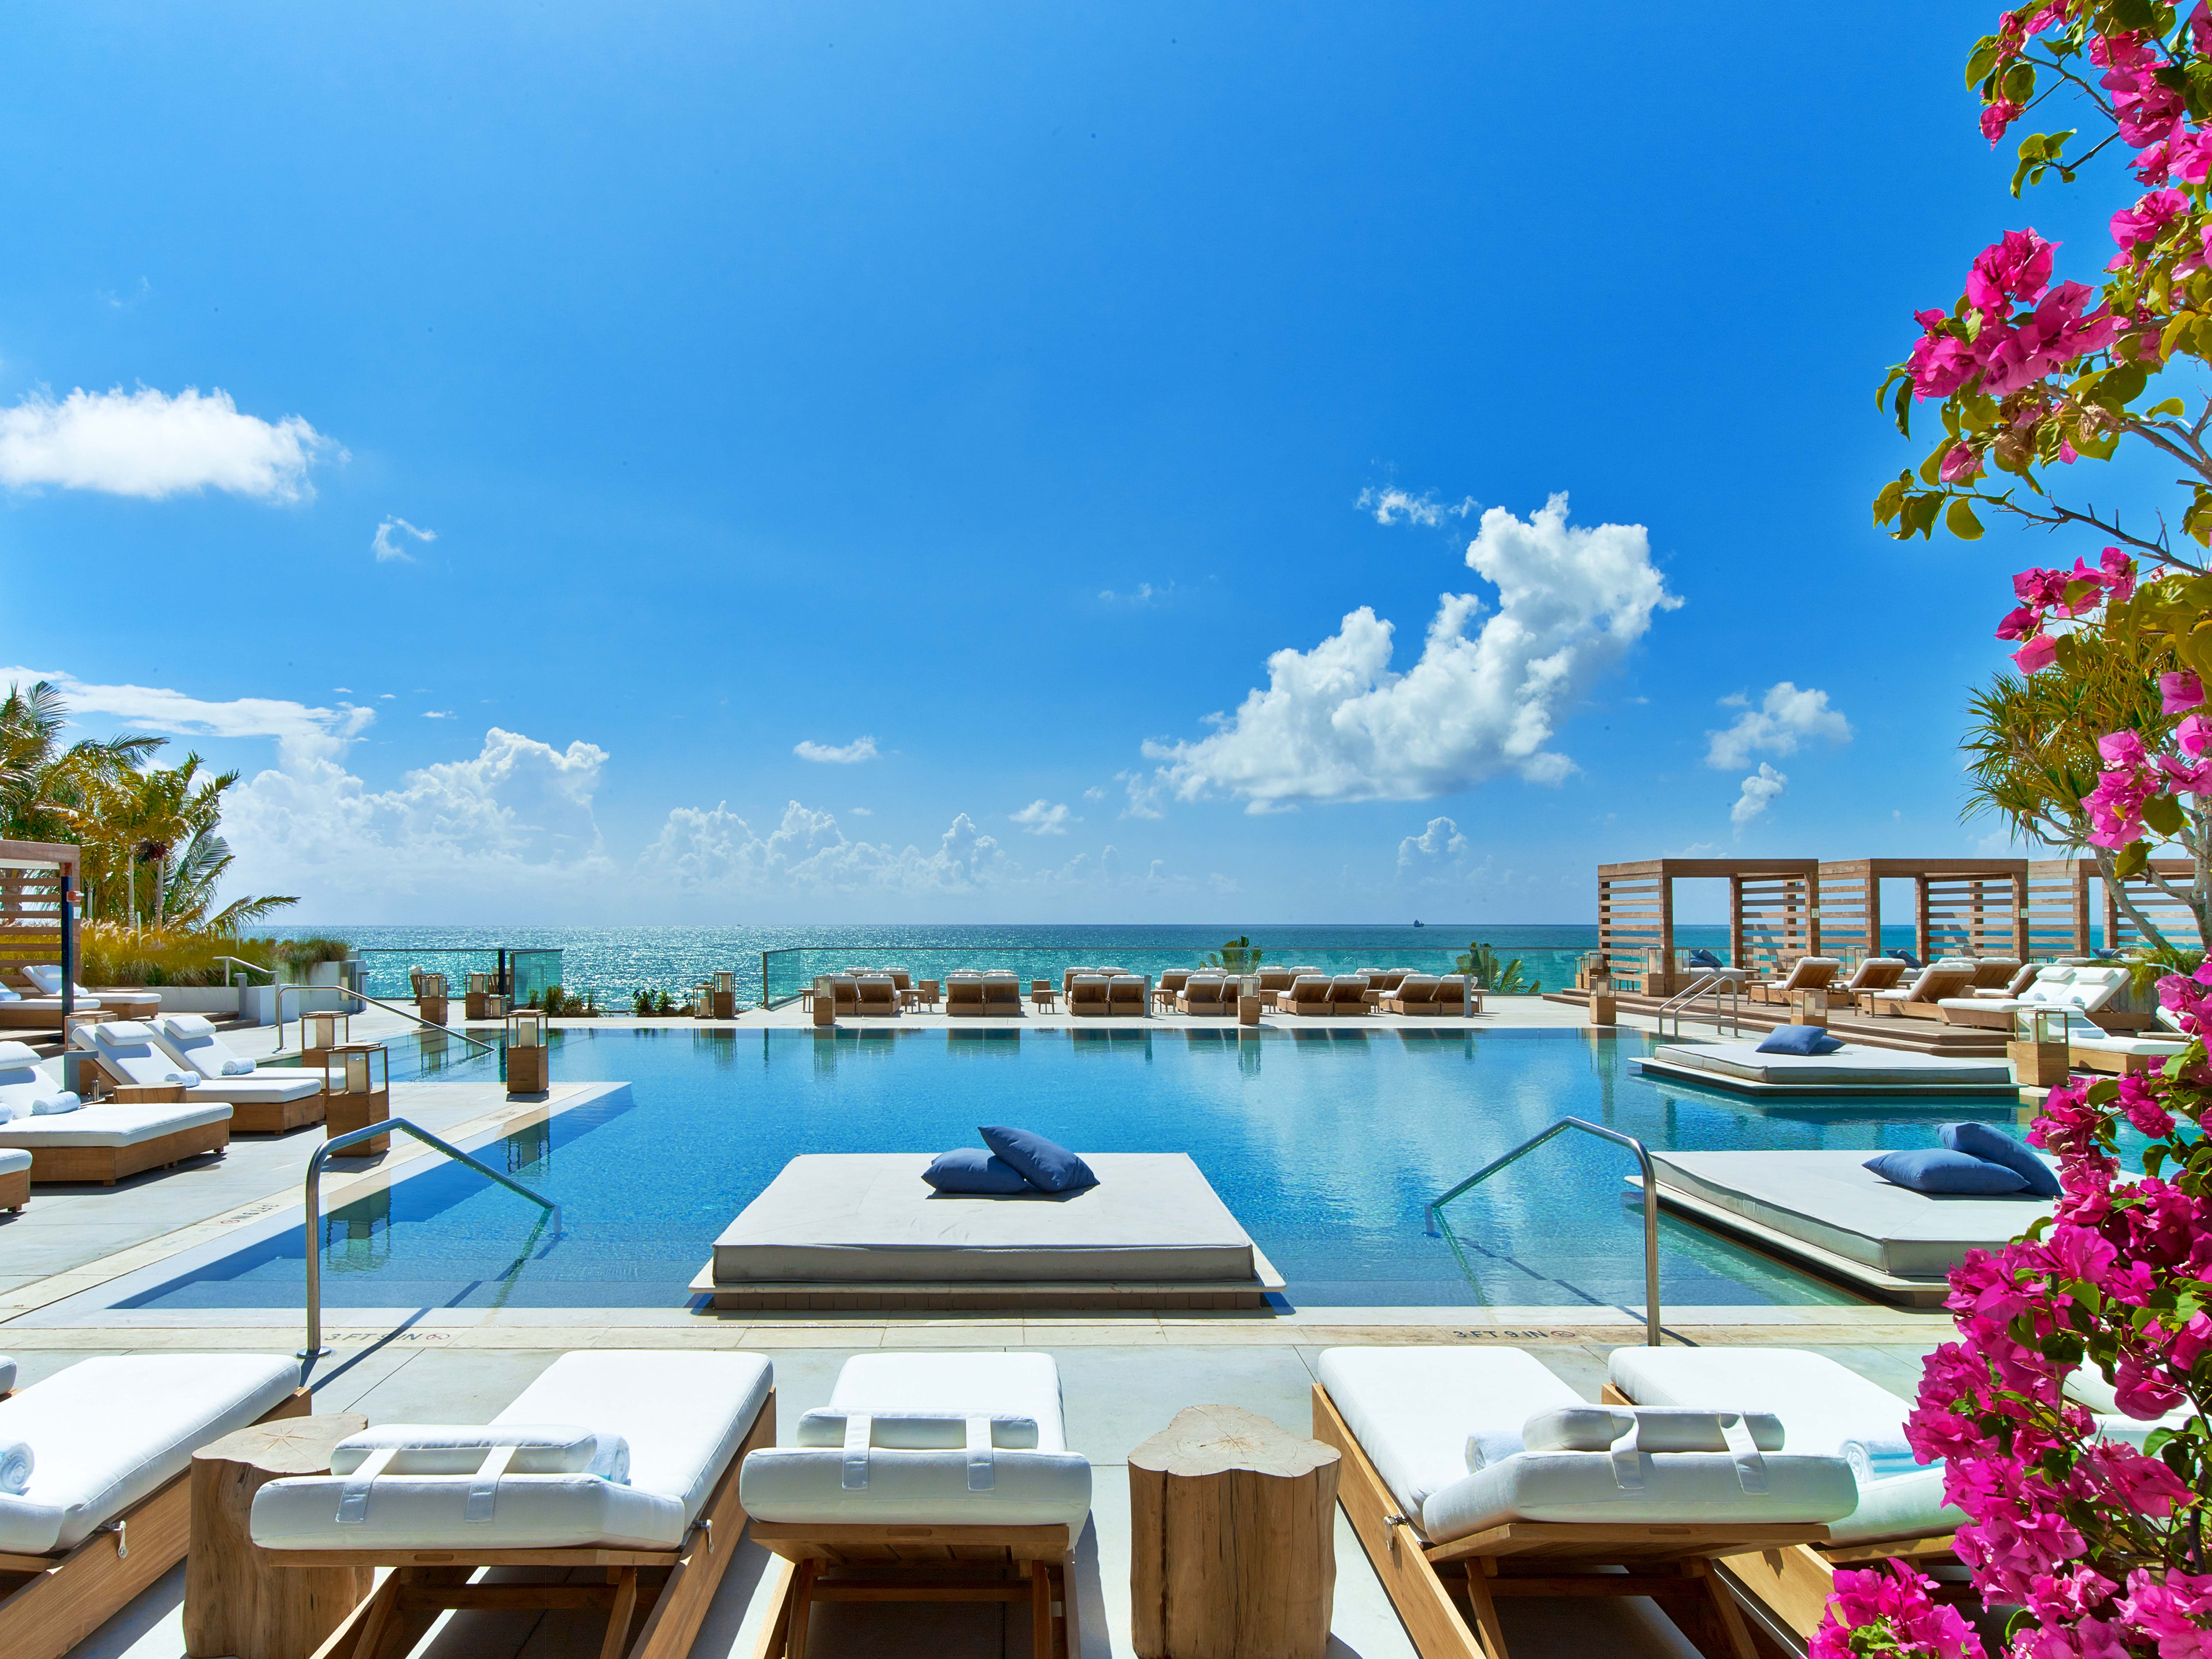 garden cheap florida beach ocean miami in stellar congress views suites south hotels hotel gardens